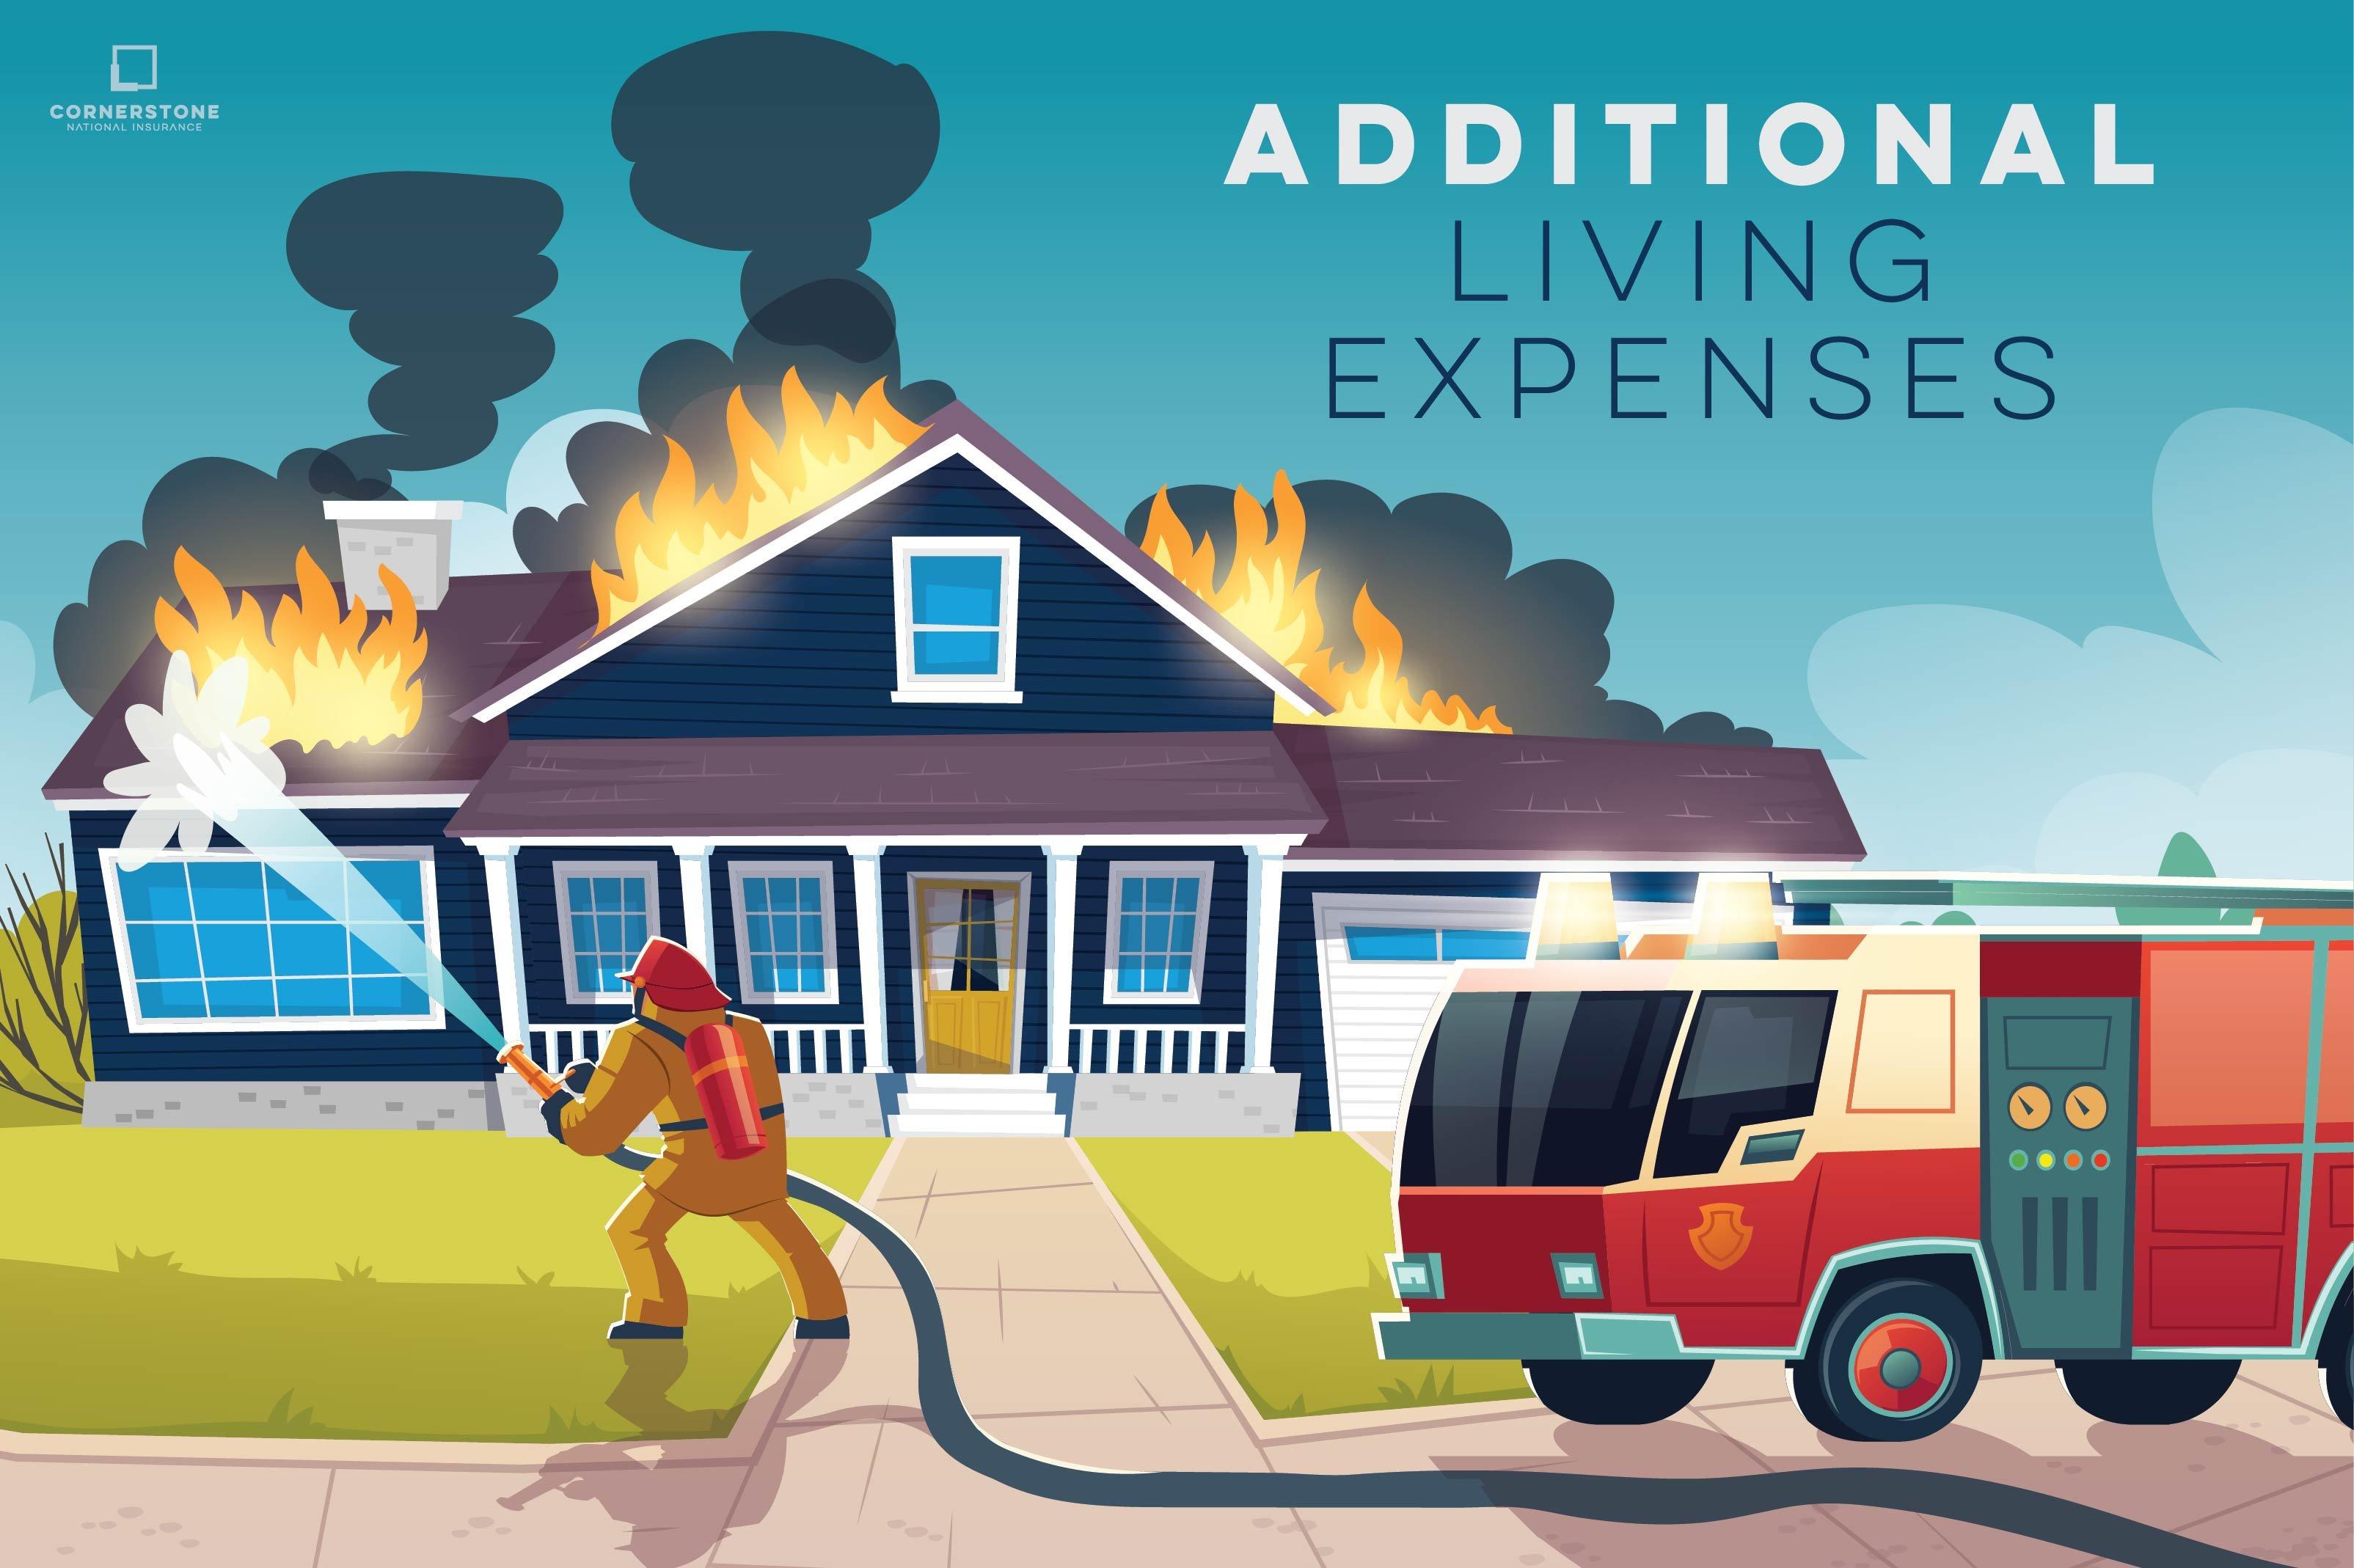 50201D_Additional Living Expenses_Blog-01